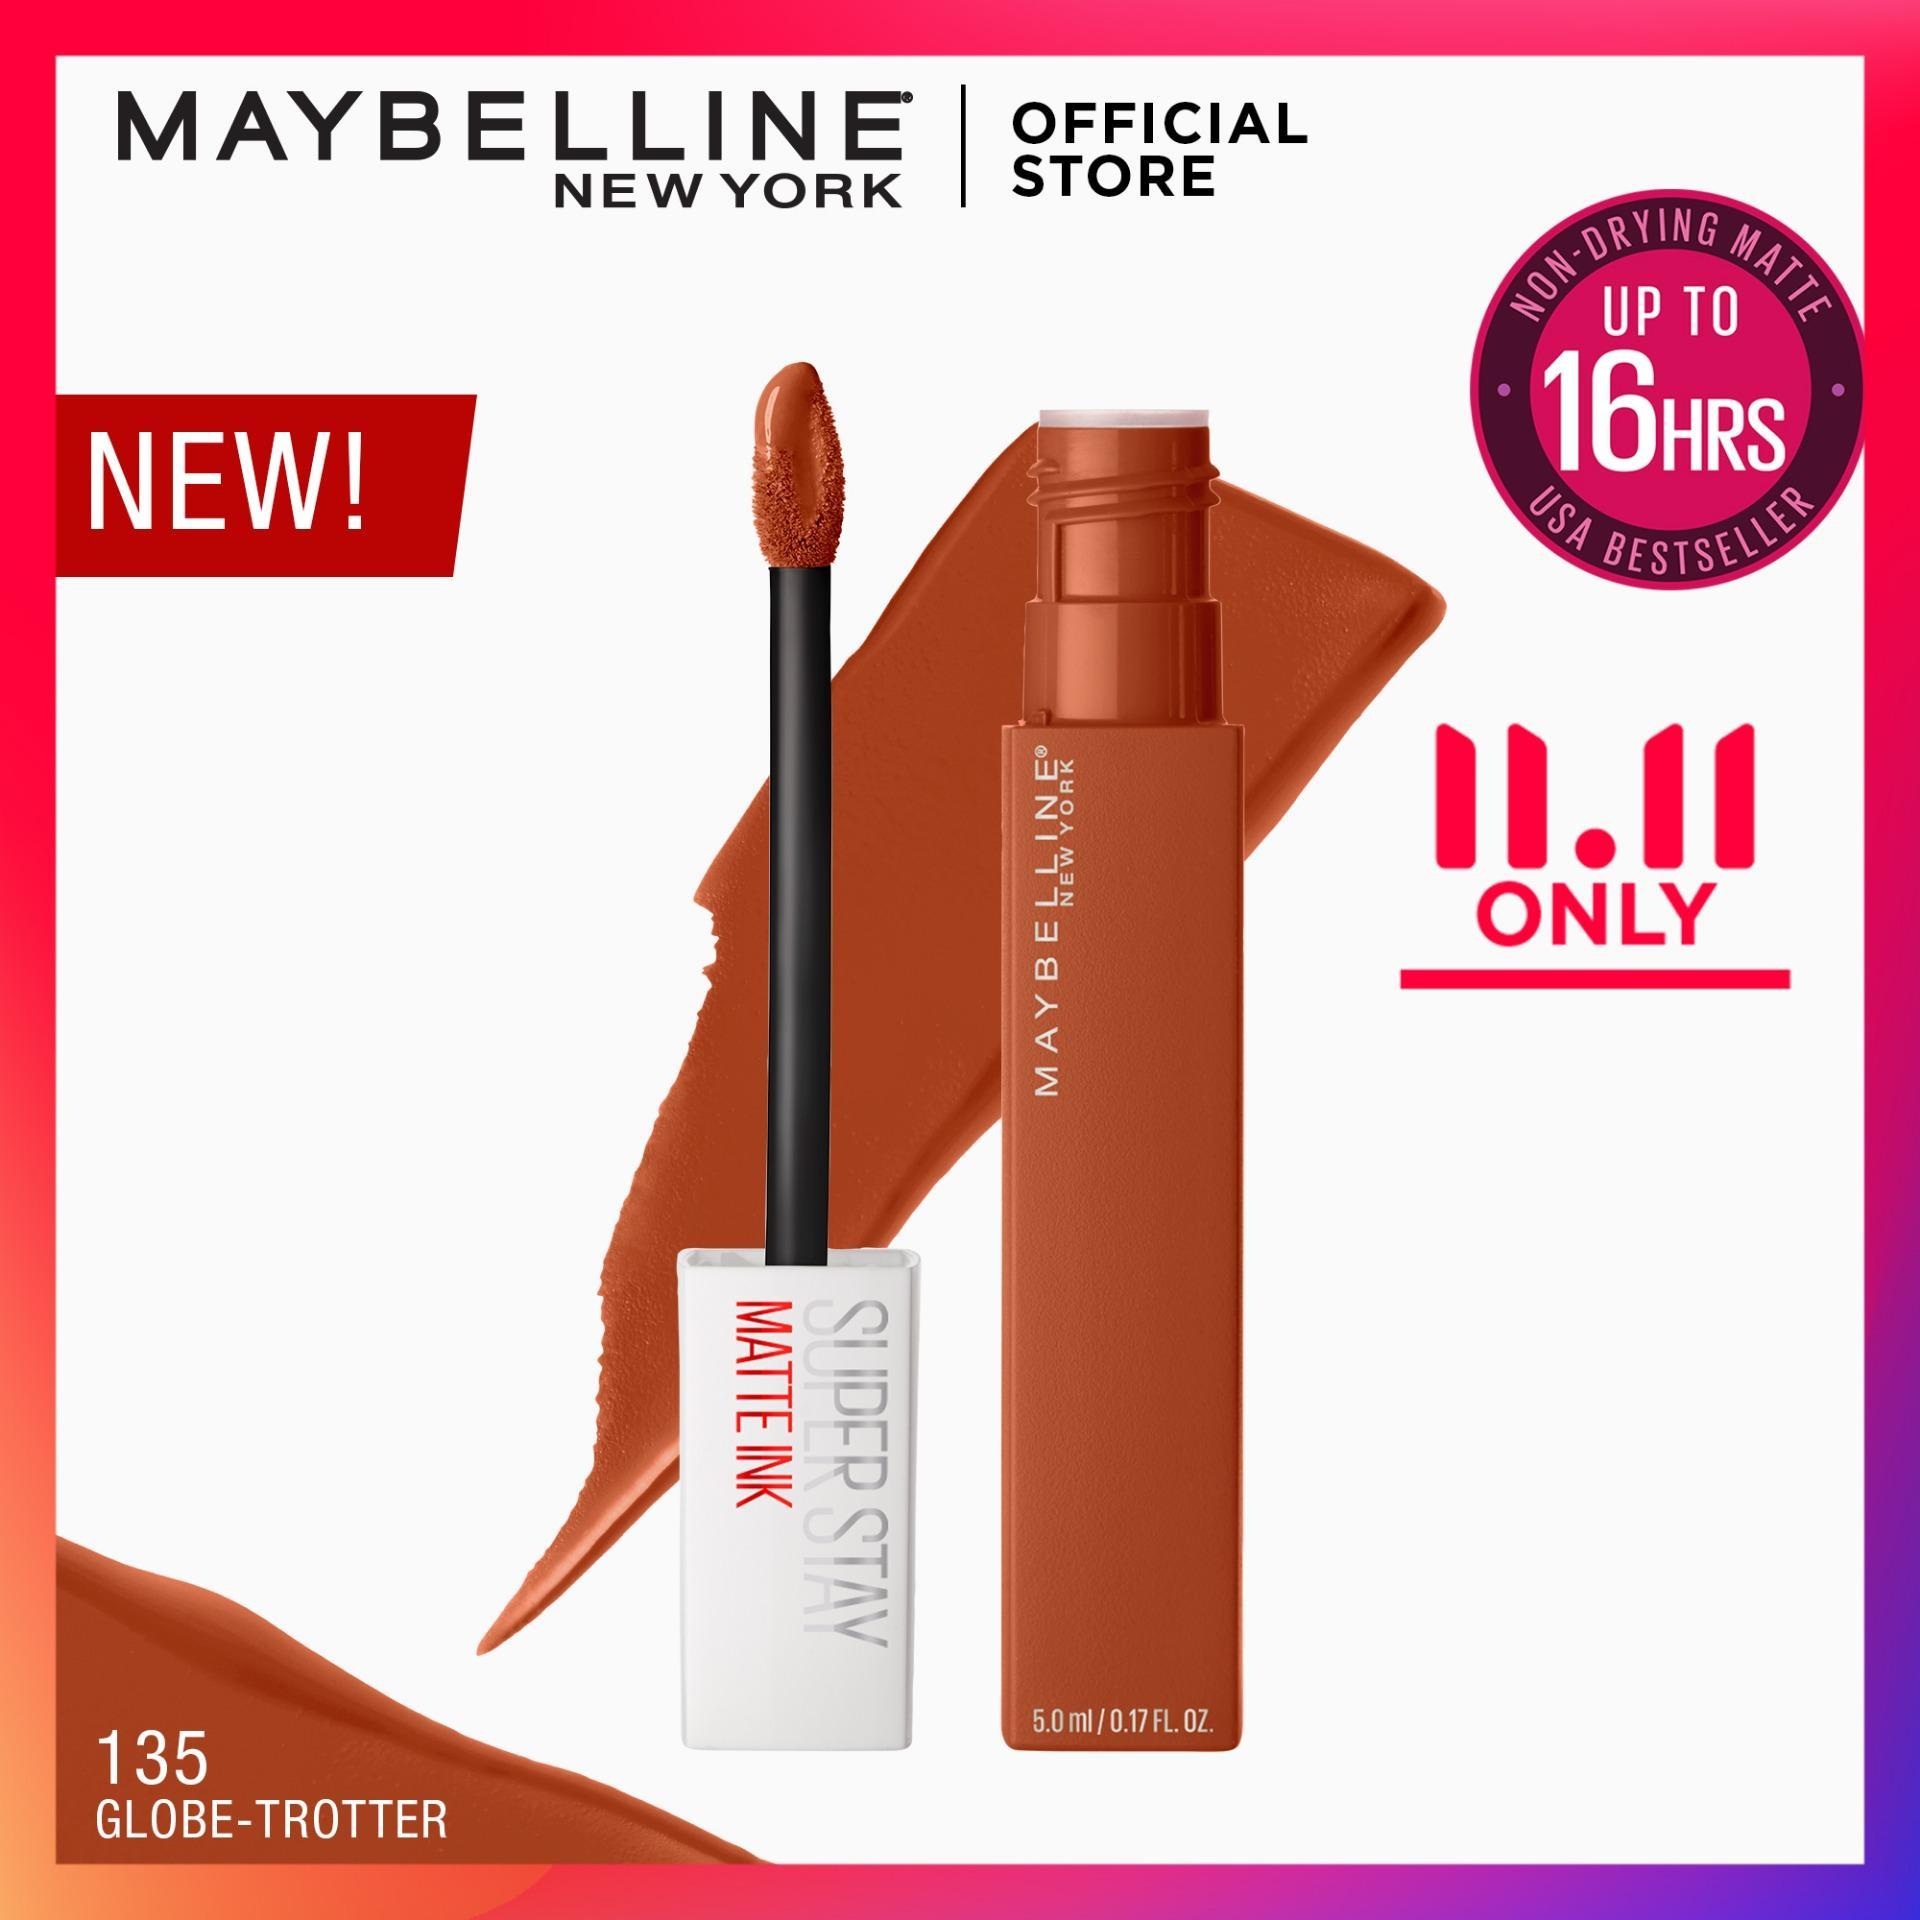 Makeup Brands Beauty On Sale Prices Set Reviews In Original Wardah Lip Cream Exclusive Matte Cair Liquid Lipsticks